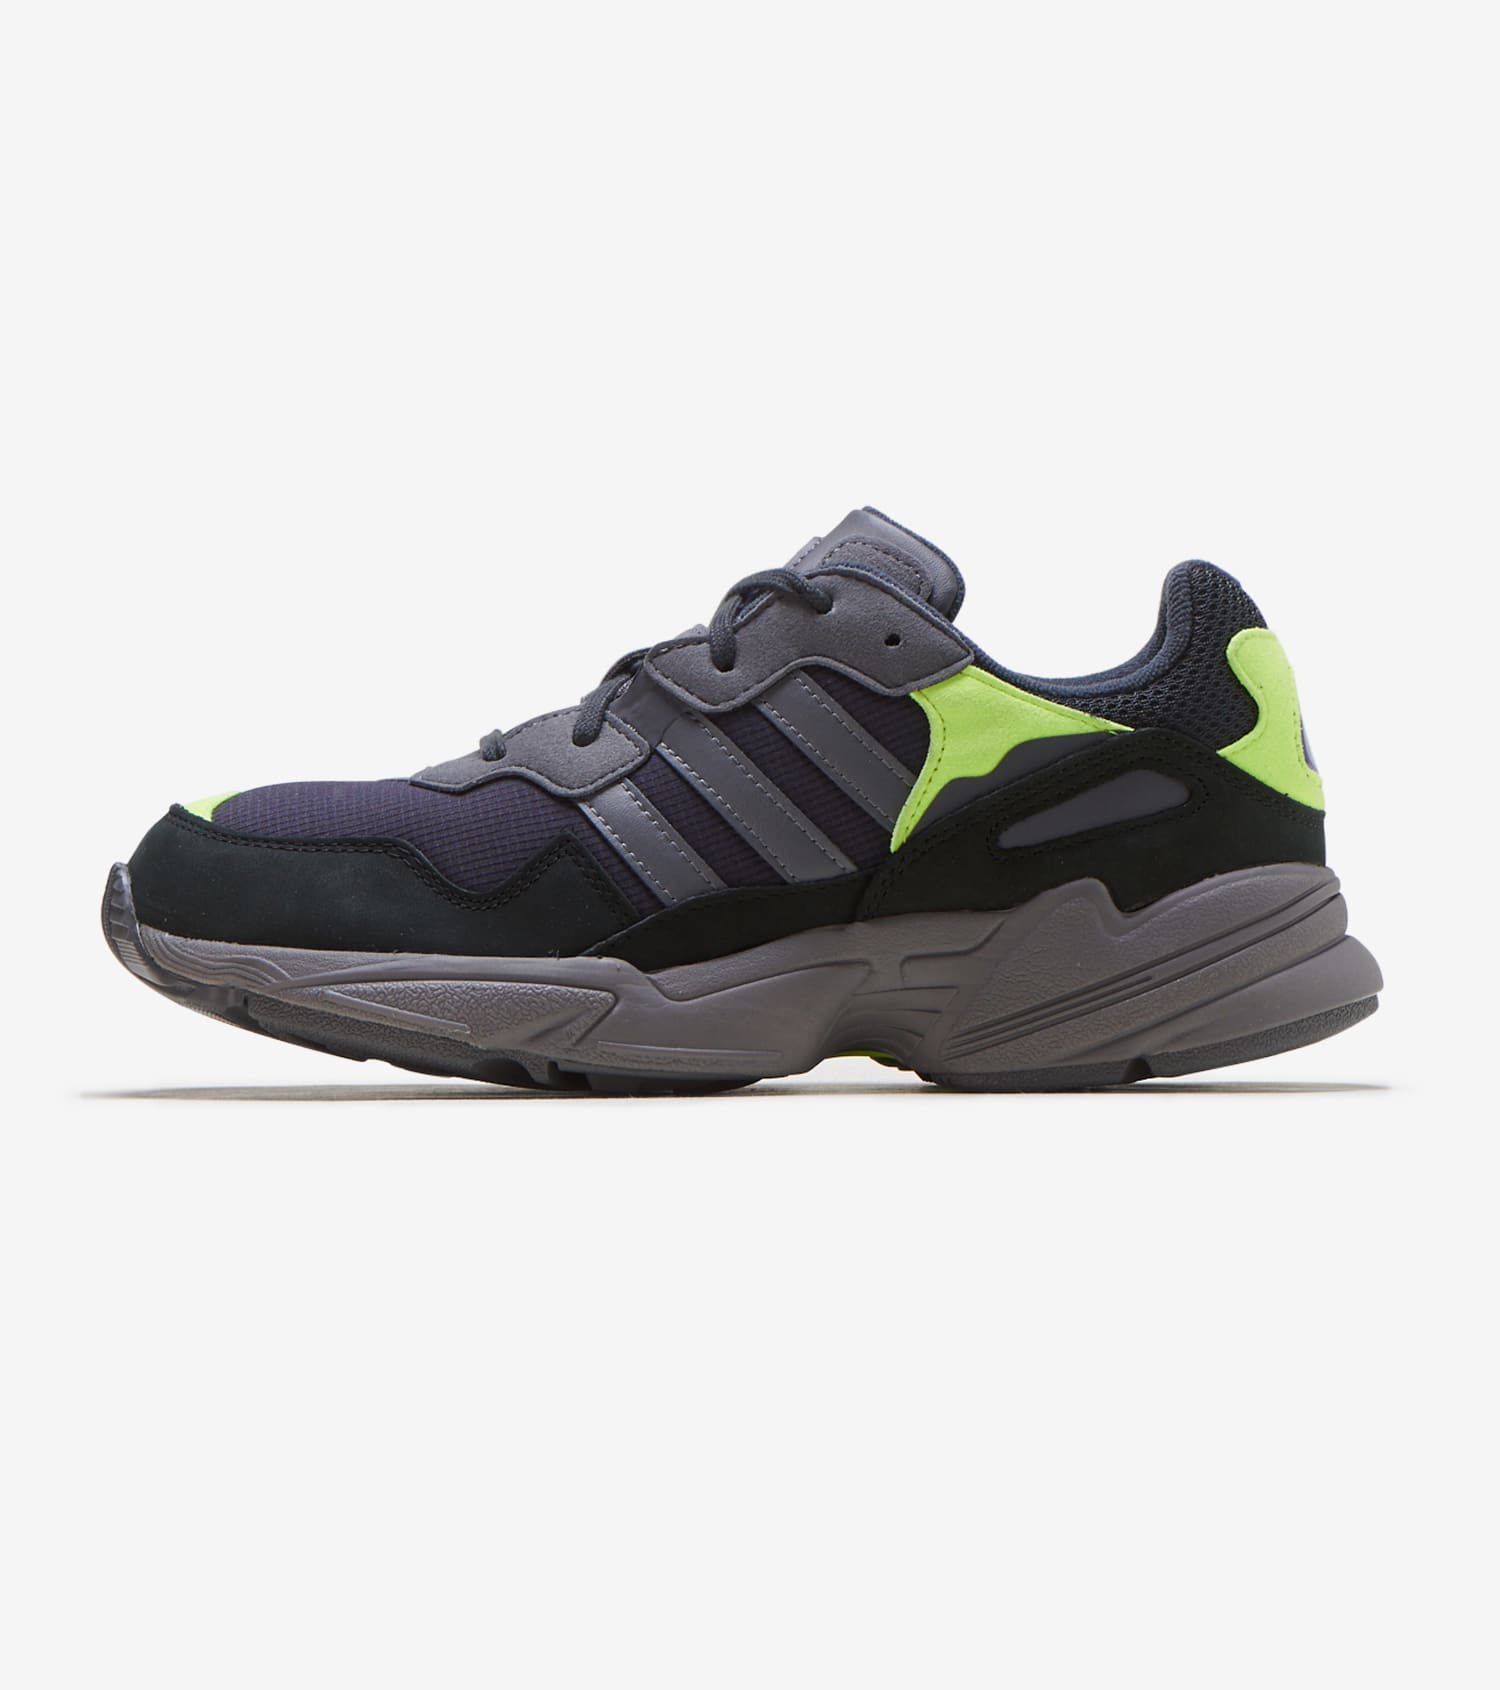 Adidas Originals Yung 96 Günstig Bestellen Sneaker Herren